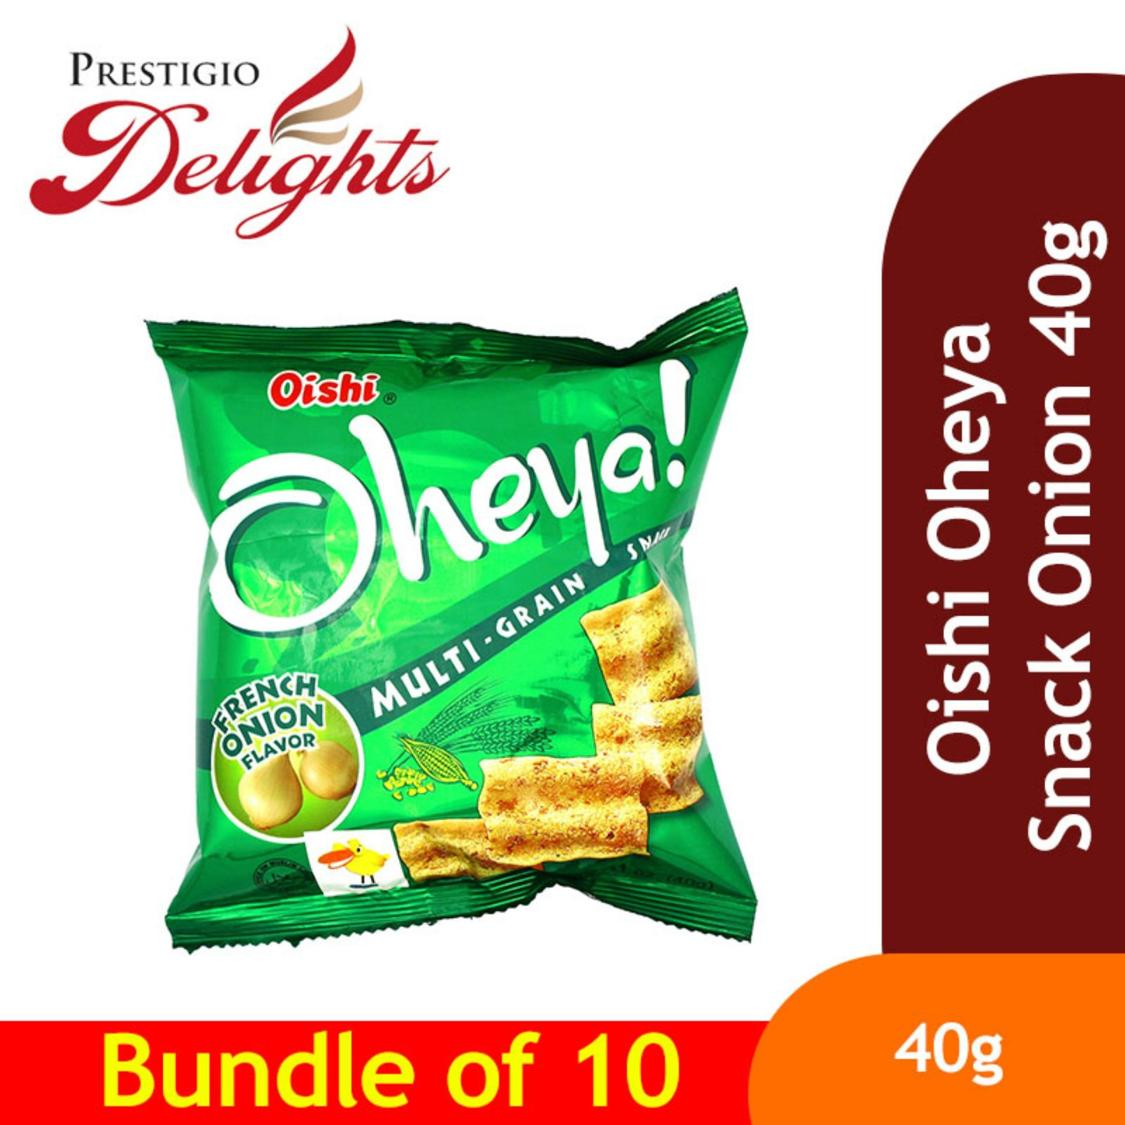 Oishi Oheya Snack Onion 40g Bundle Of 10 By Prestigio Delights.